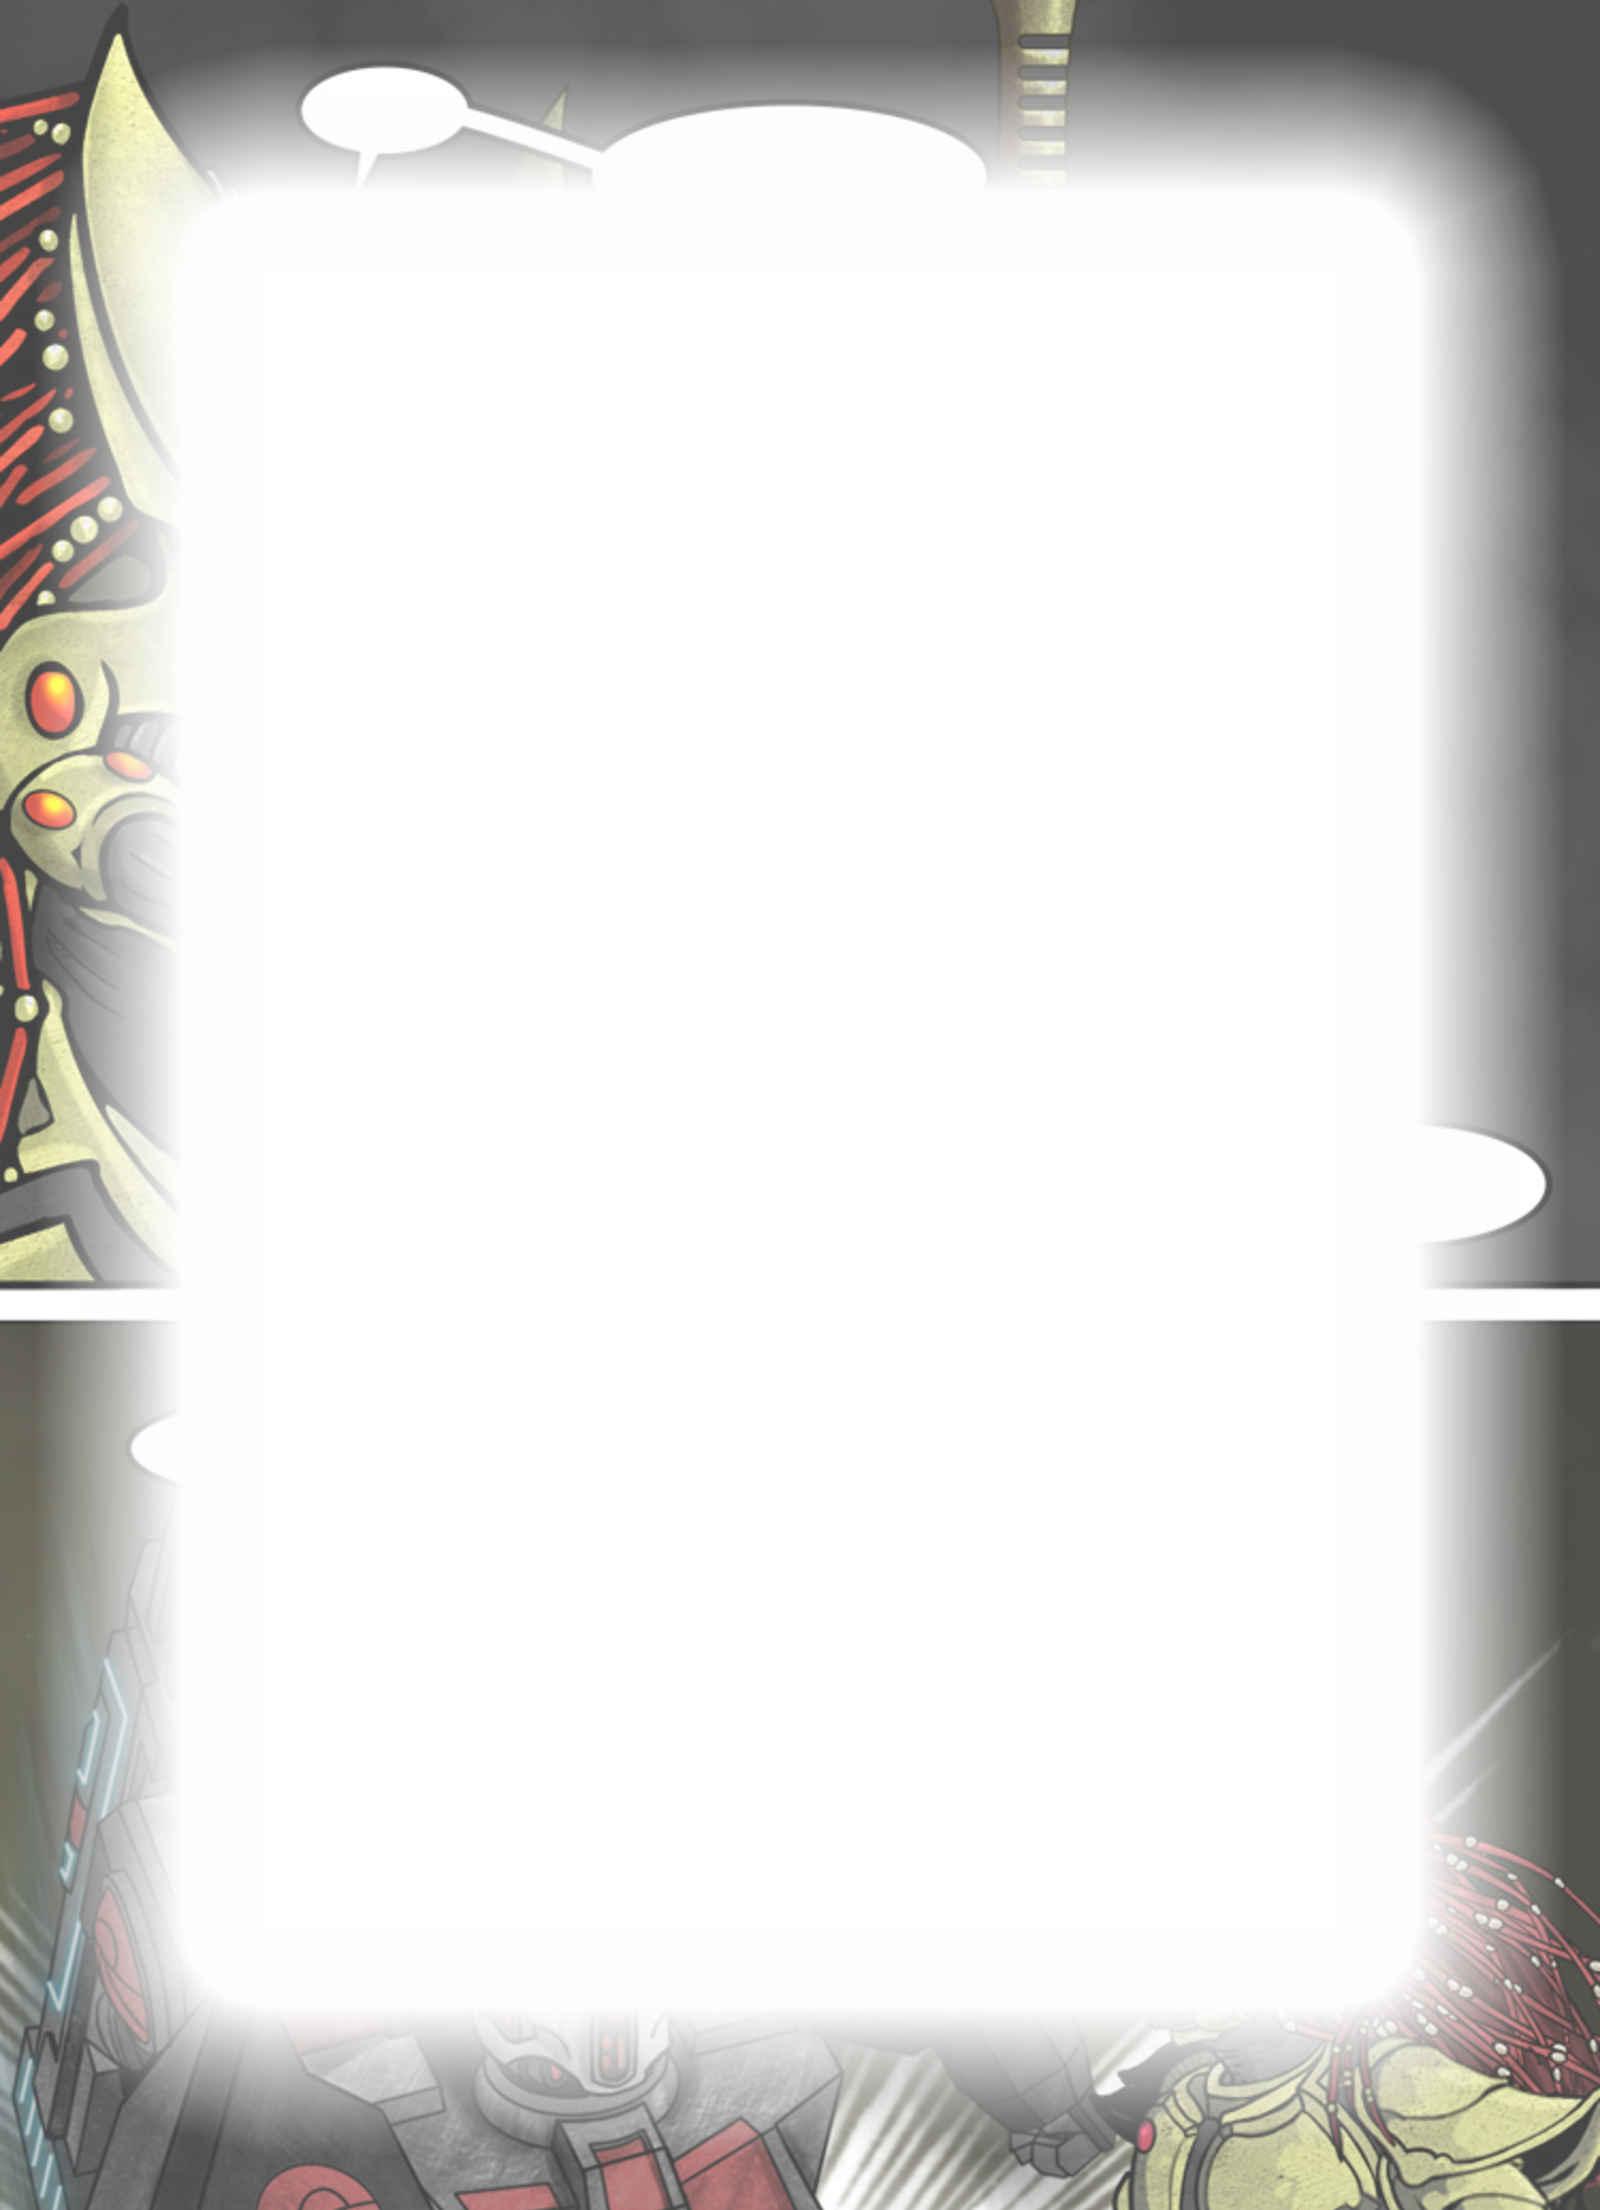 Eatatau! : Chapitre 2 page 123